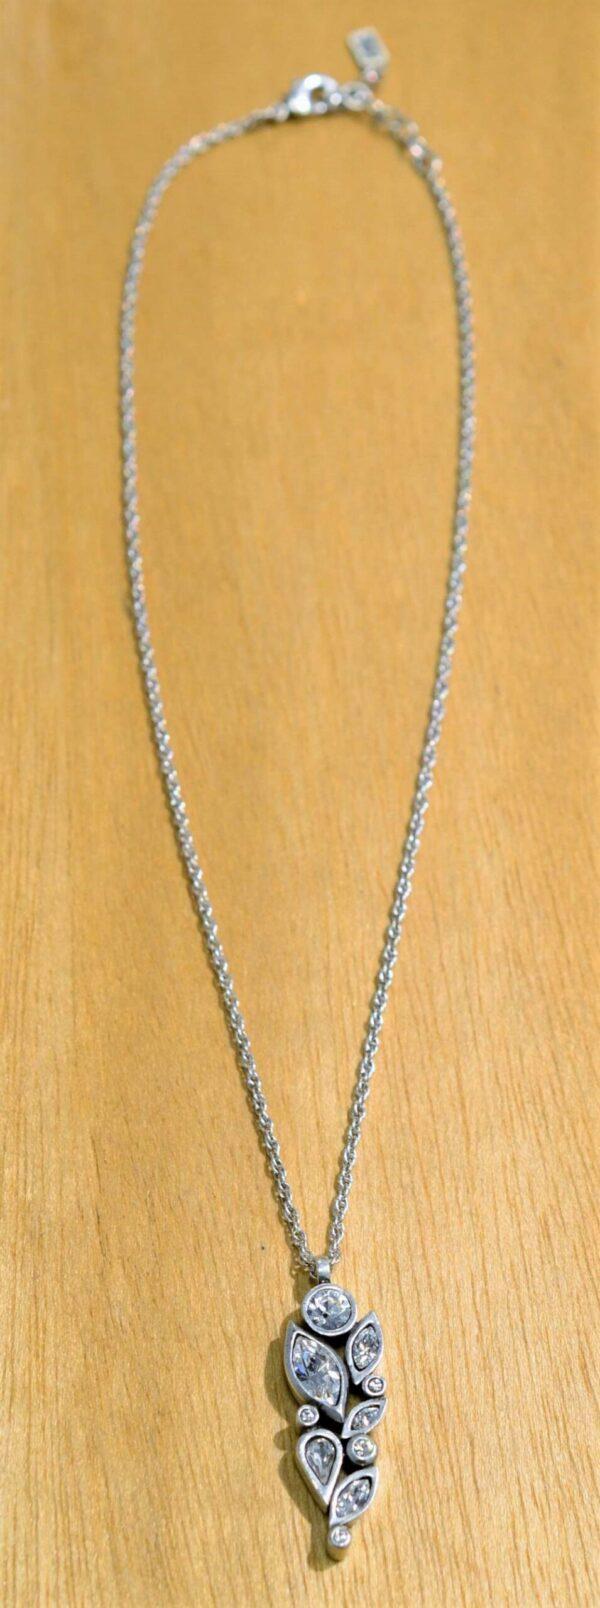 Patricia Locke Fleur silvertone necklace in All Crystal